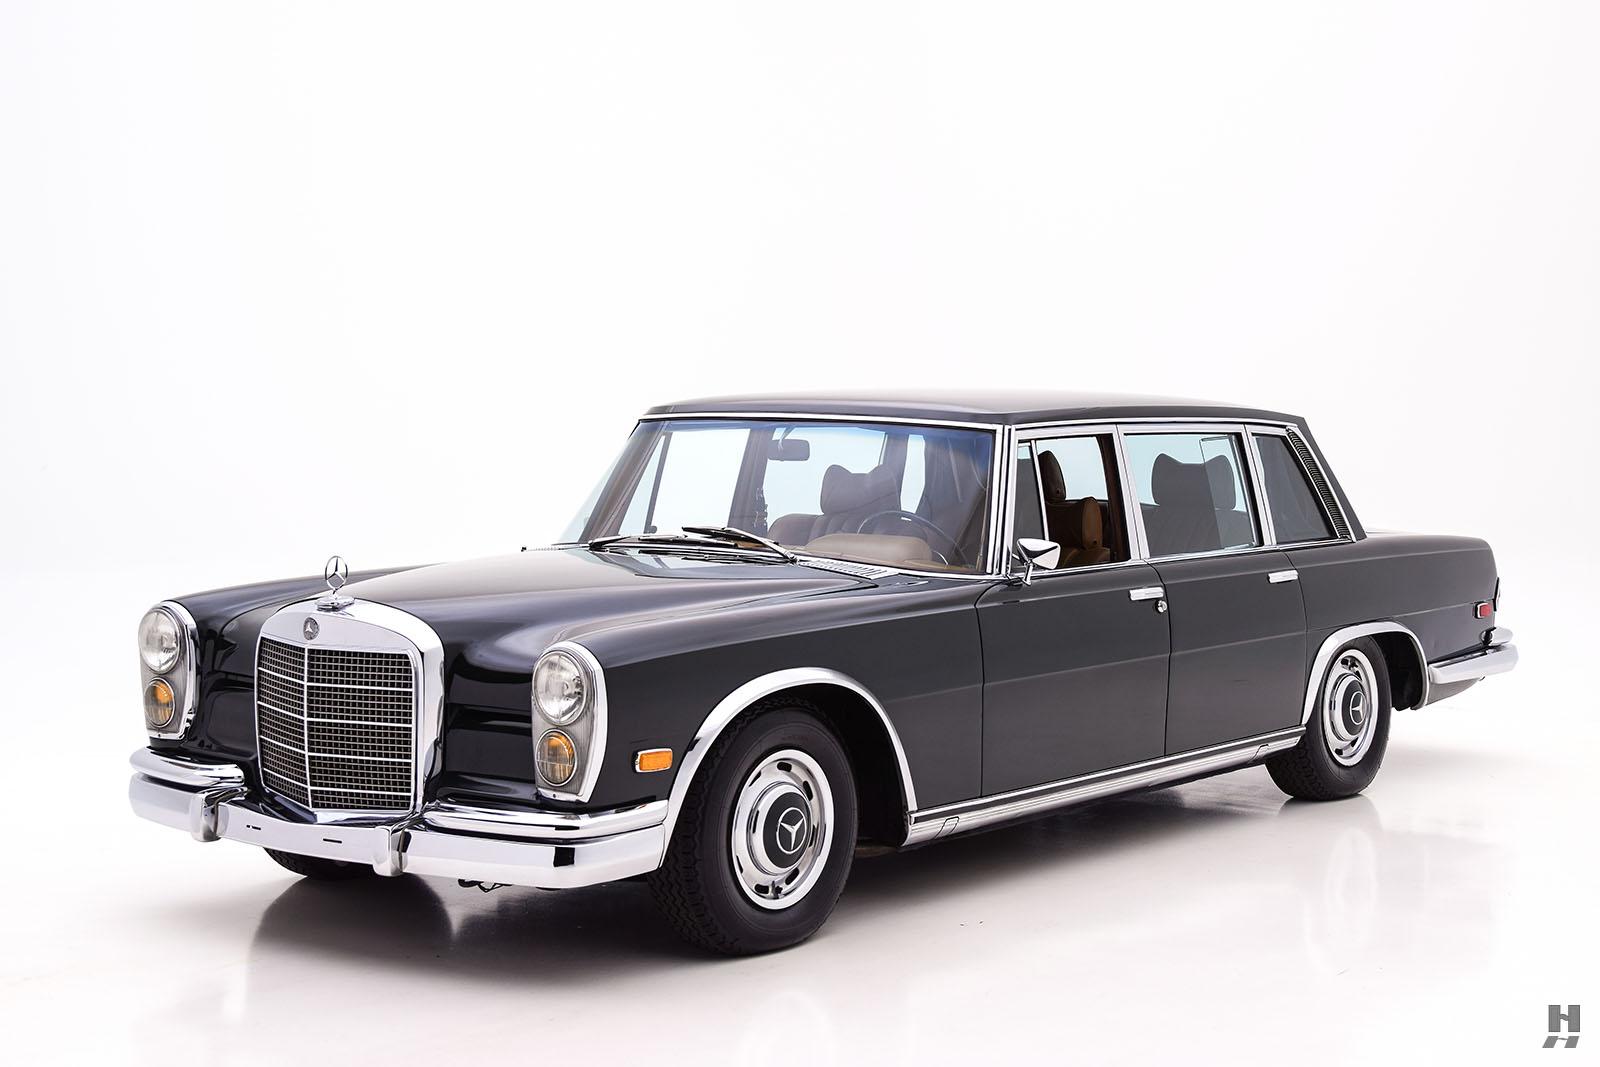 1969 mercedes benz 600 sedan hyman ltd classic cars. Black Bedroom Furniture Sets. Home Design Ideas